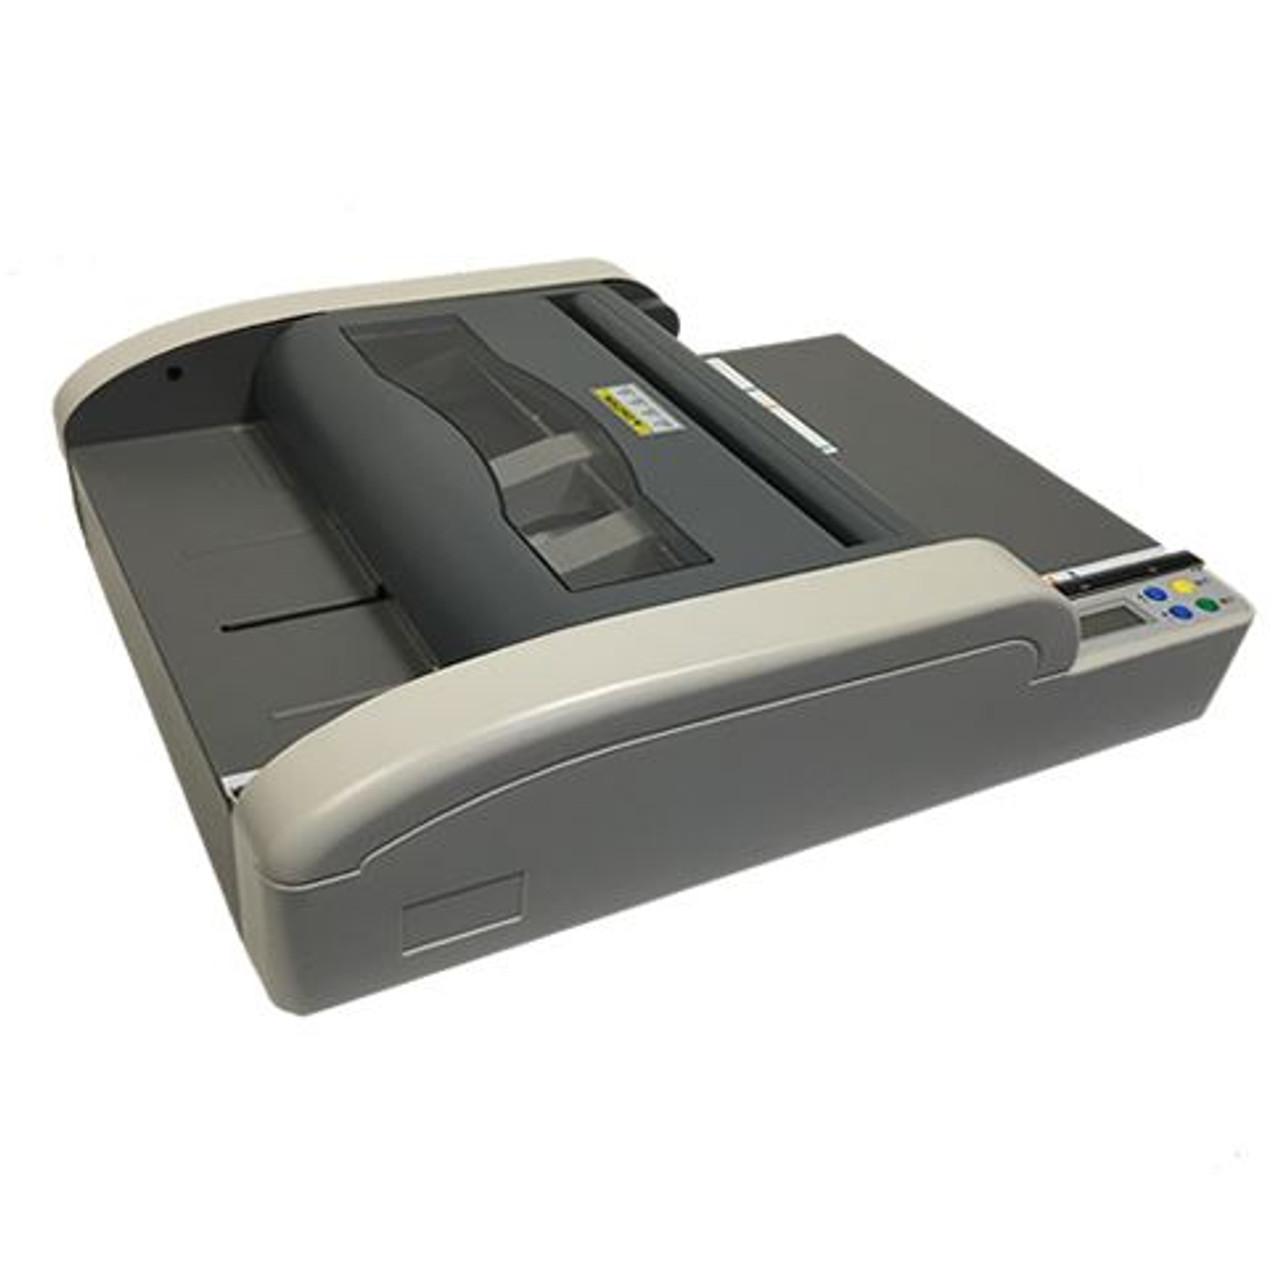 Galaxy Bookit PRO Auto Staple Booklet Maker